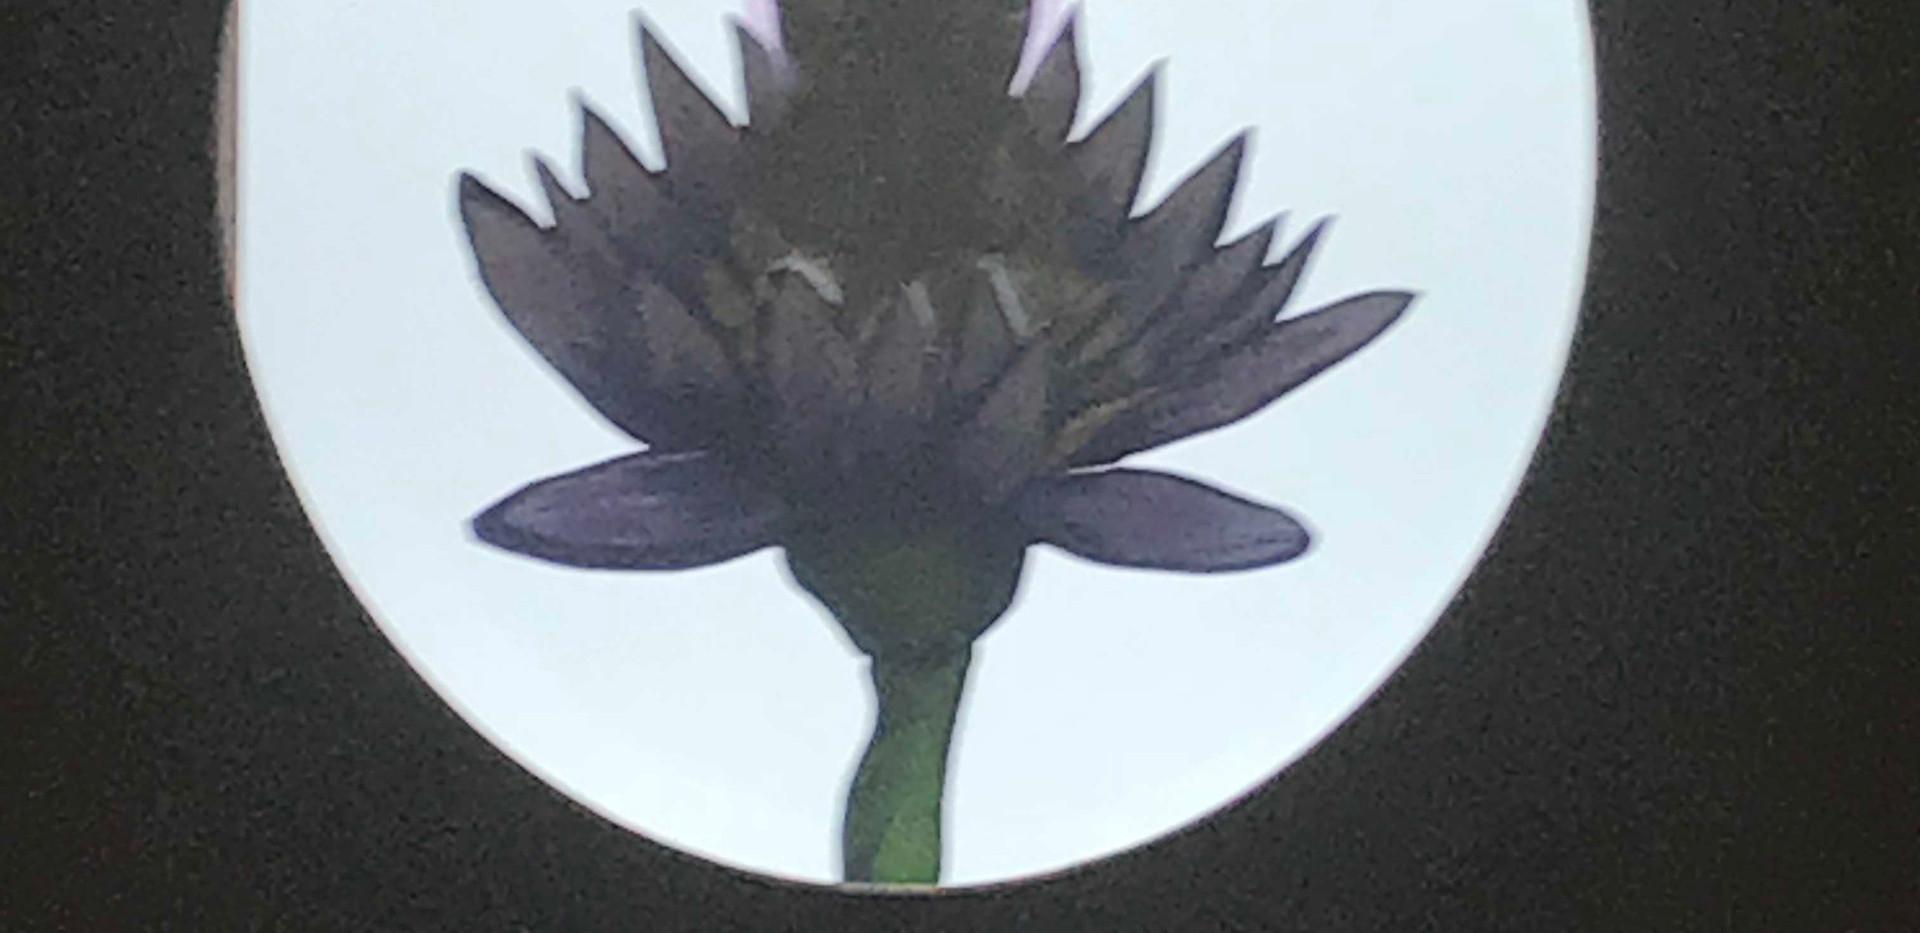 Transforming Into Light (detail)